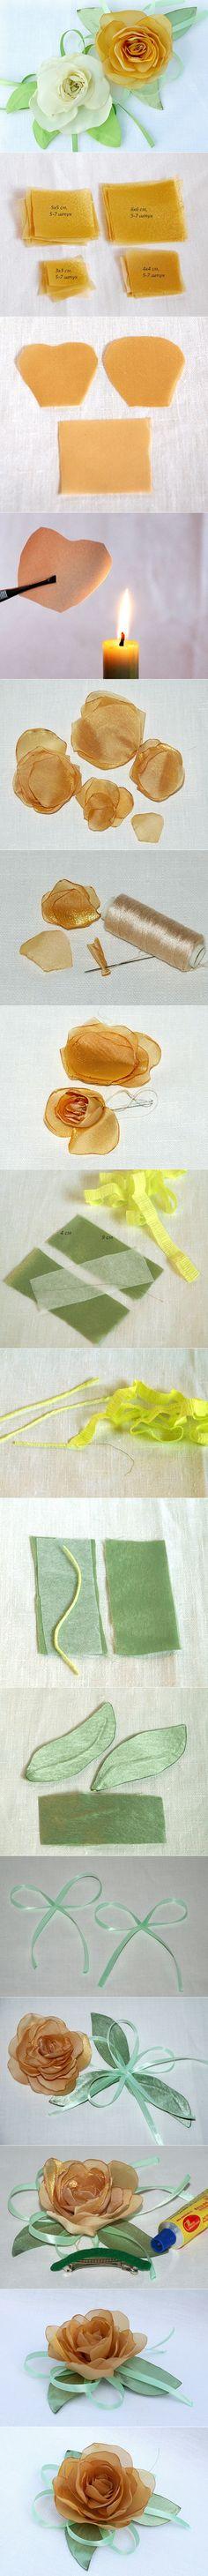 Chiffon rose tutorial http://www.fabartdiy.com/diy-chiffon-rose-master-class/